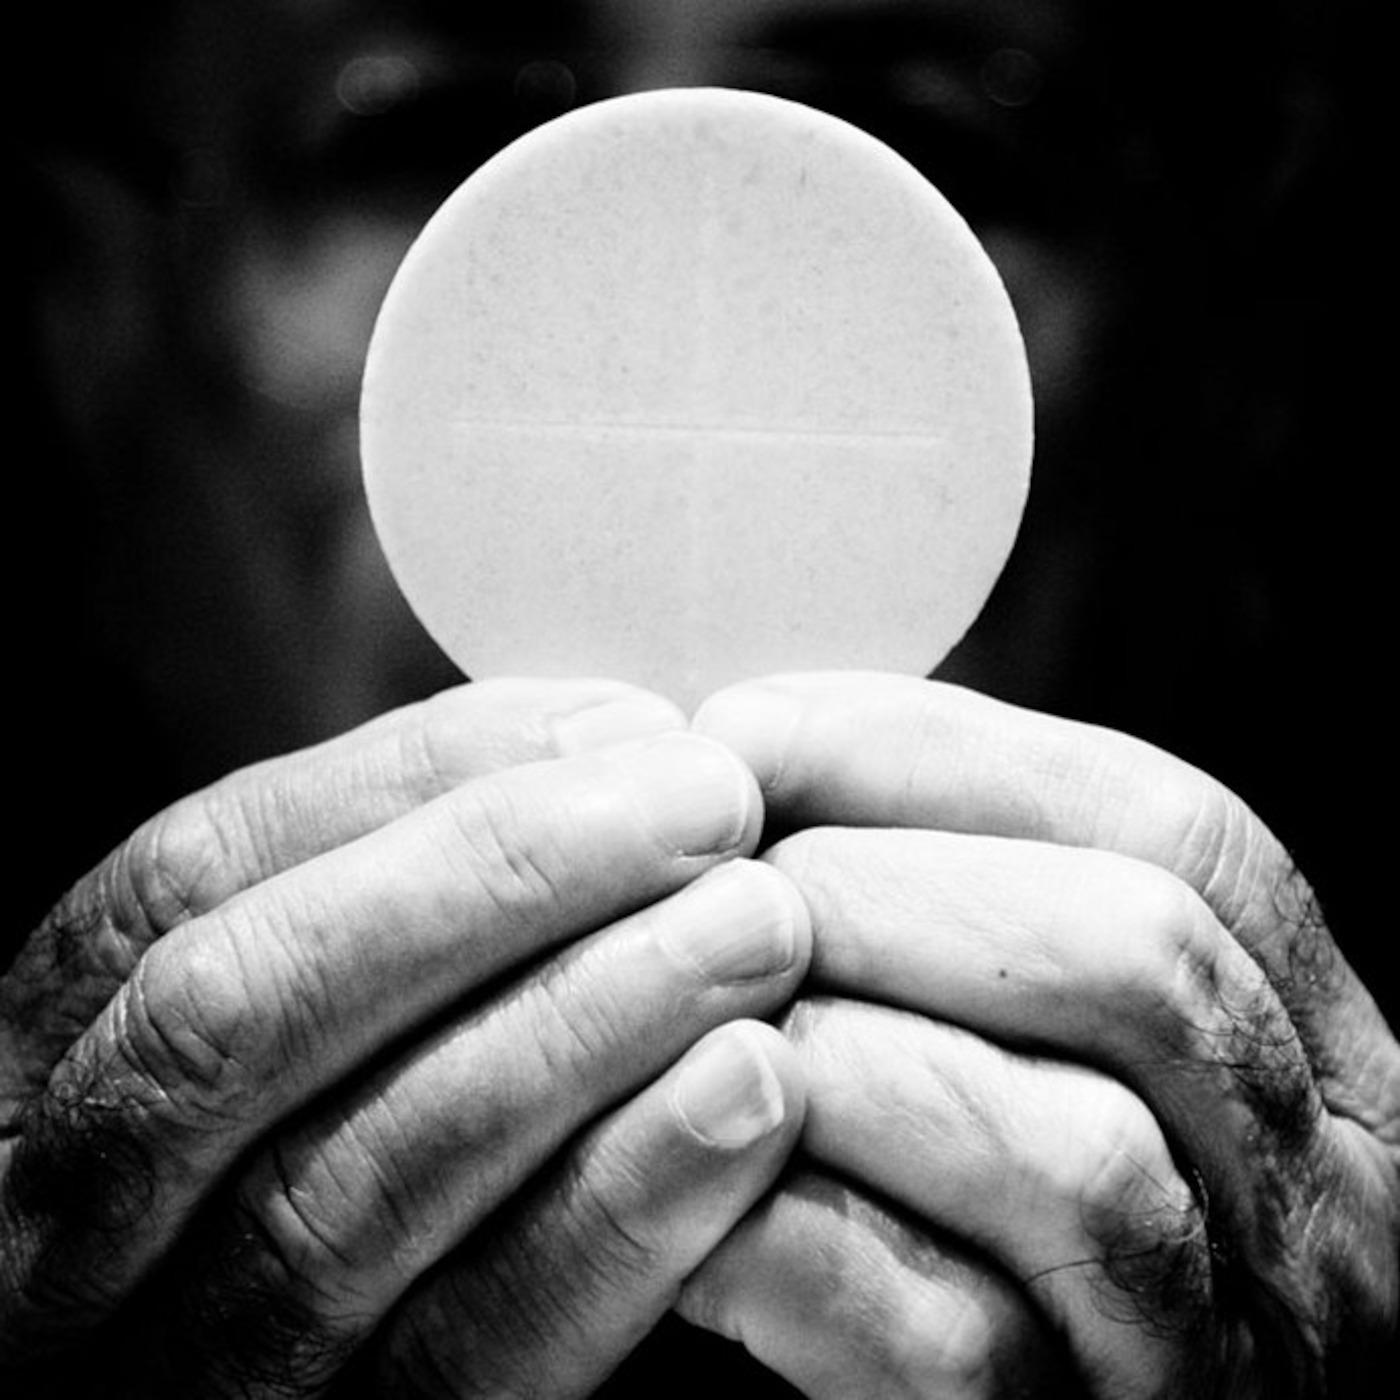 Father Justin Paskert